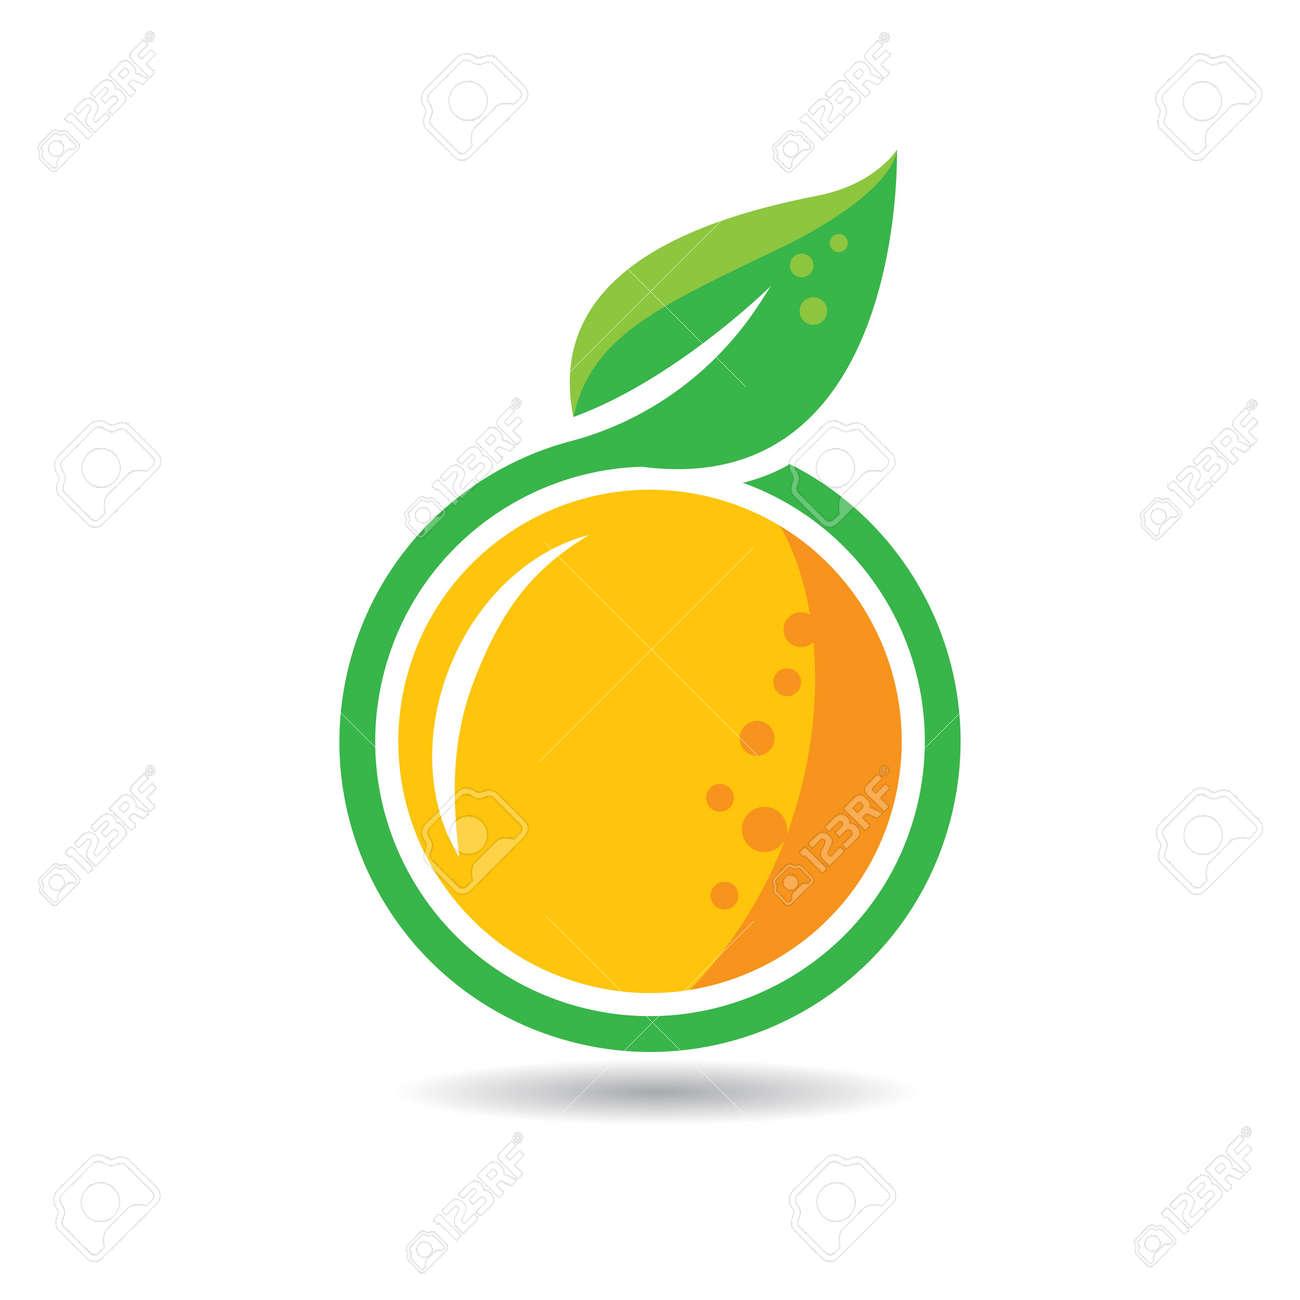 Lemon logo images illustration design - 173287686